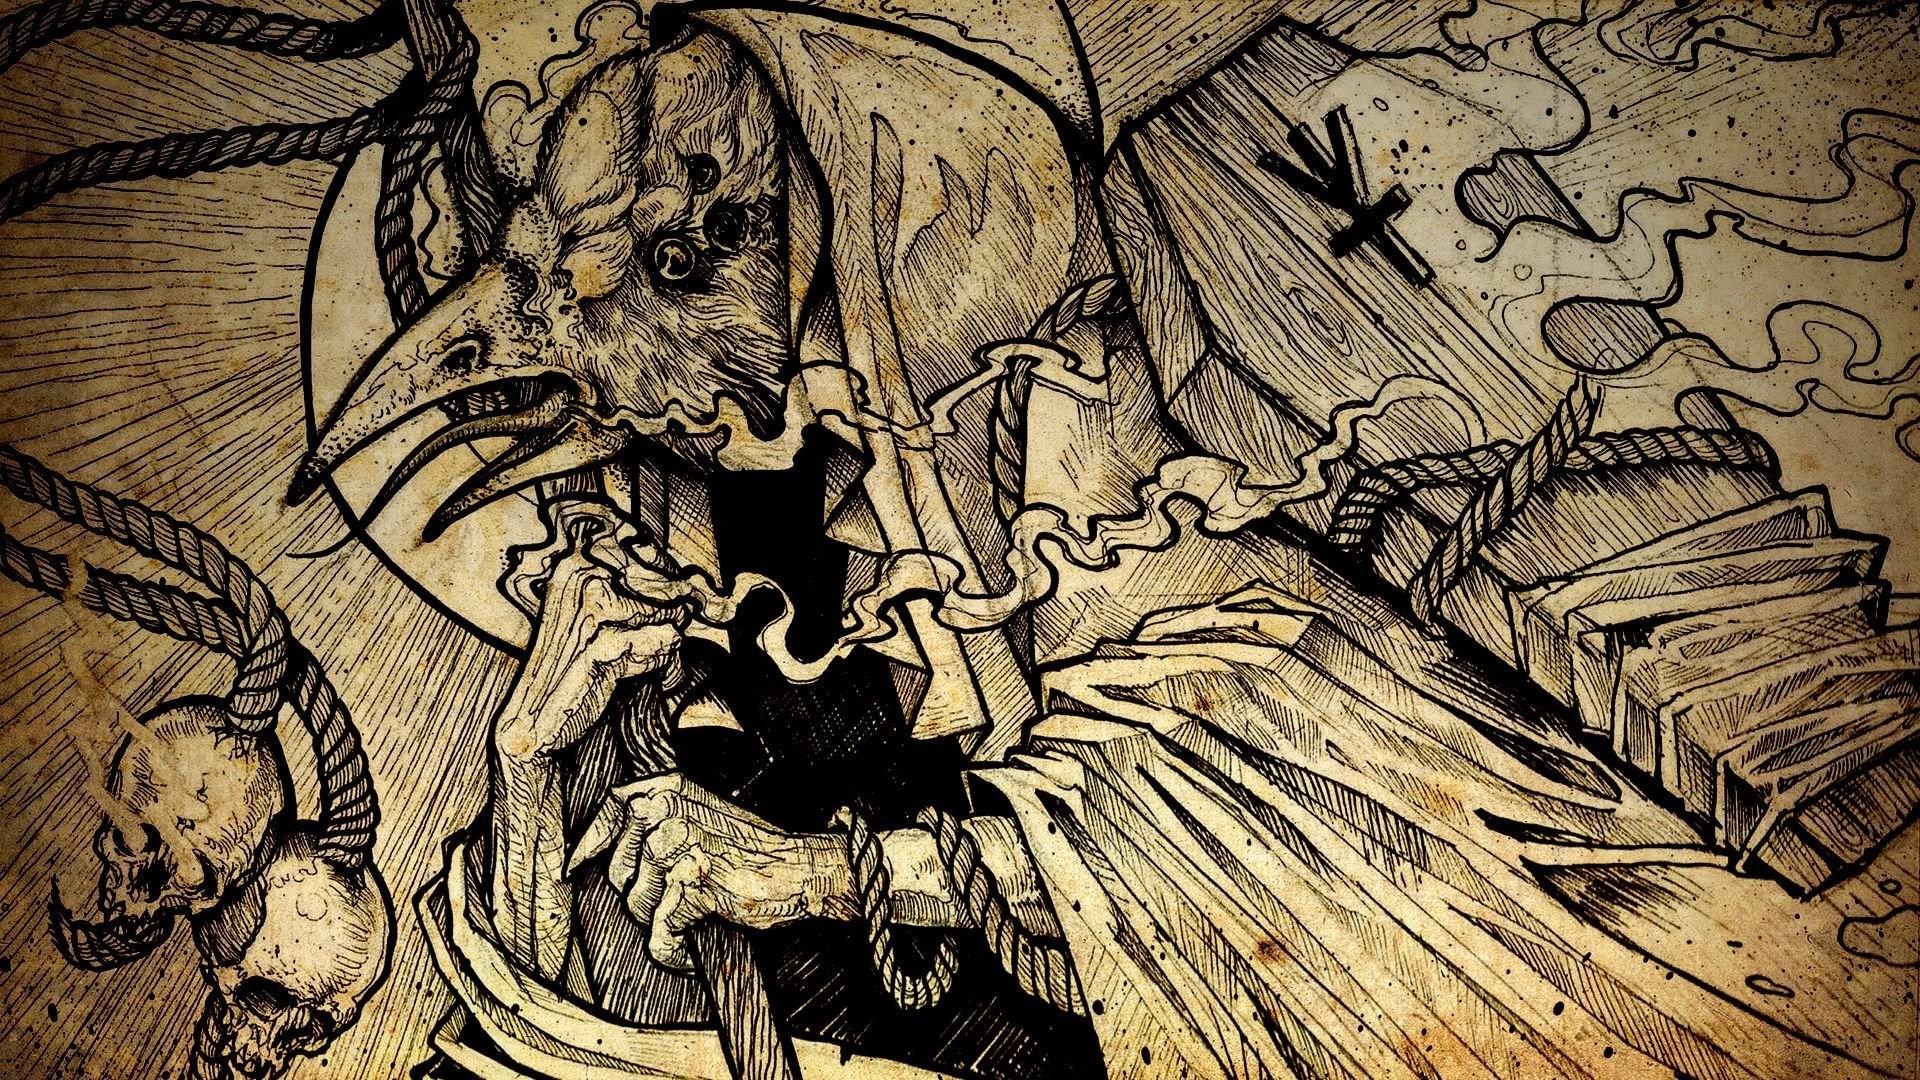 Death metal wallpaper 55 images - Death metal wallpaper ...